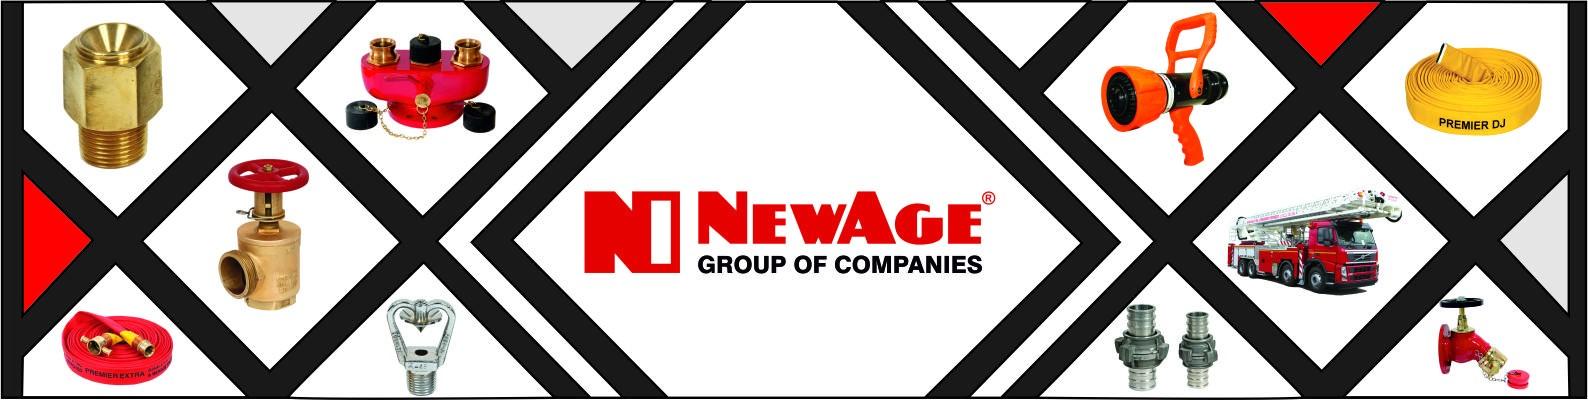 NewAge Fire Fighting Co Ltd | LinkedIn